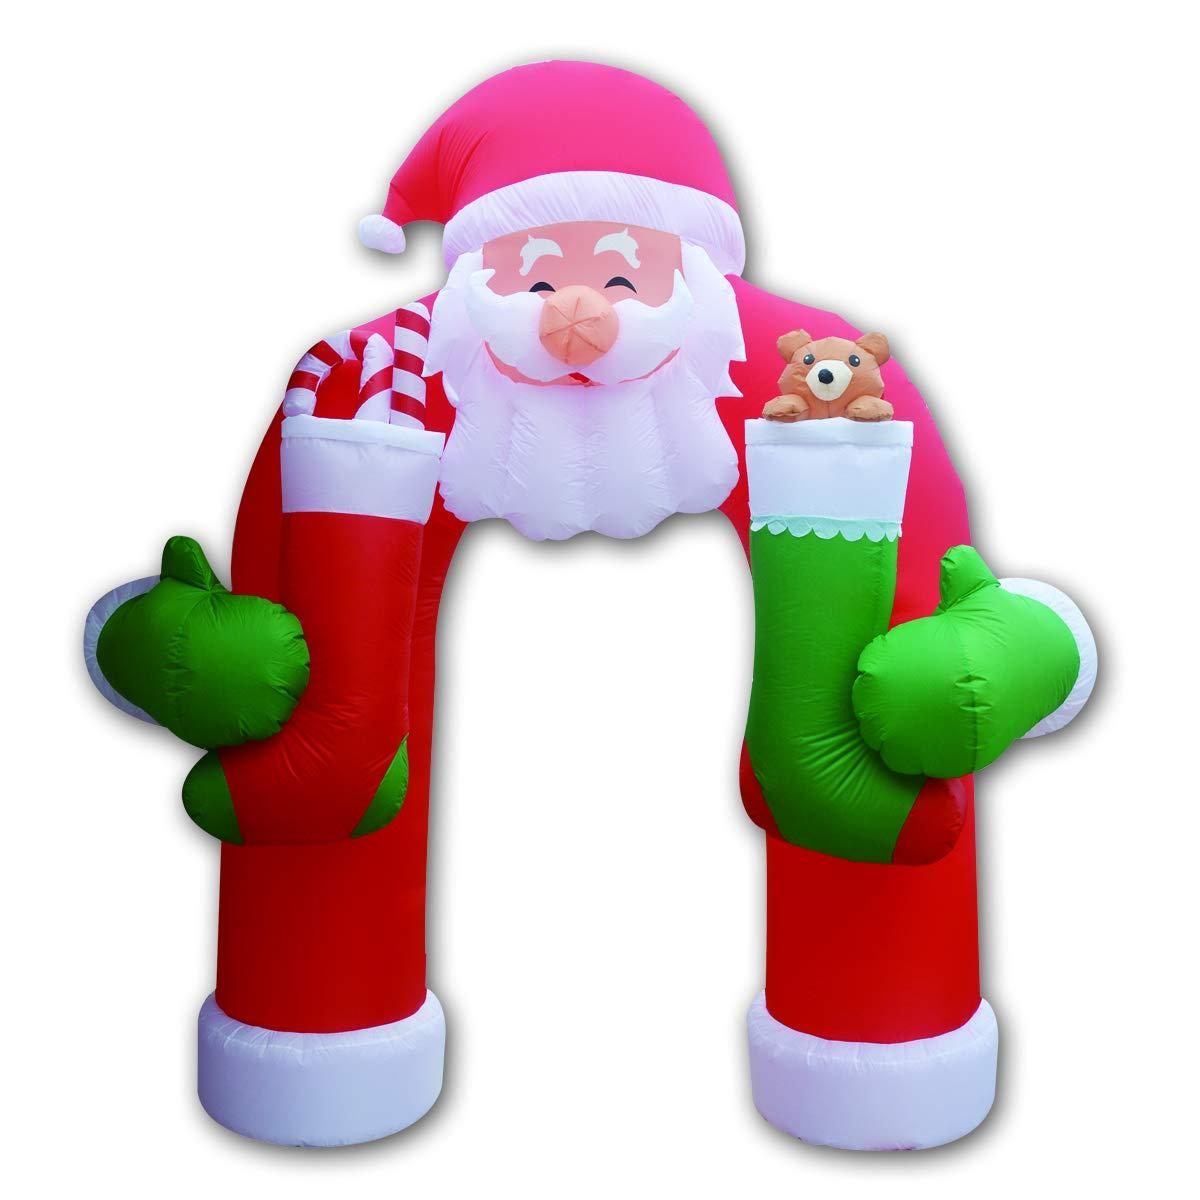 Amazon.com: Goosh - Arco de Navidad inflable de 11 pies ...